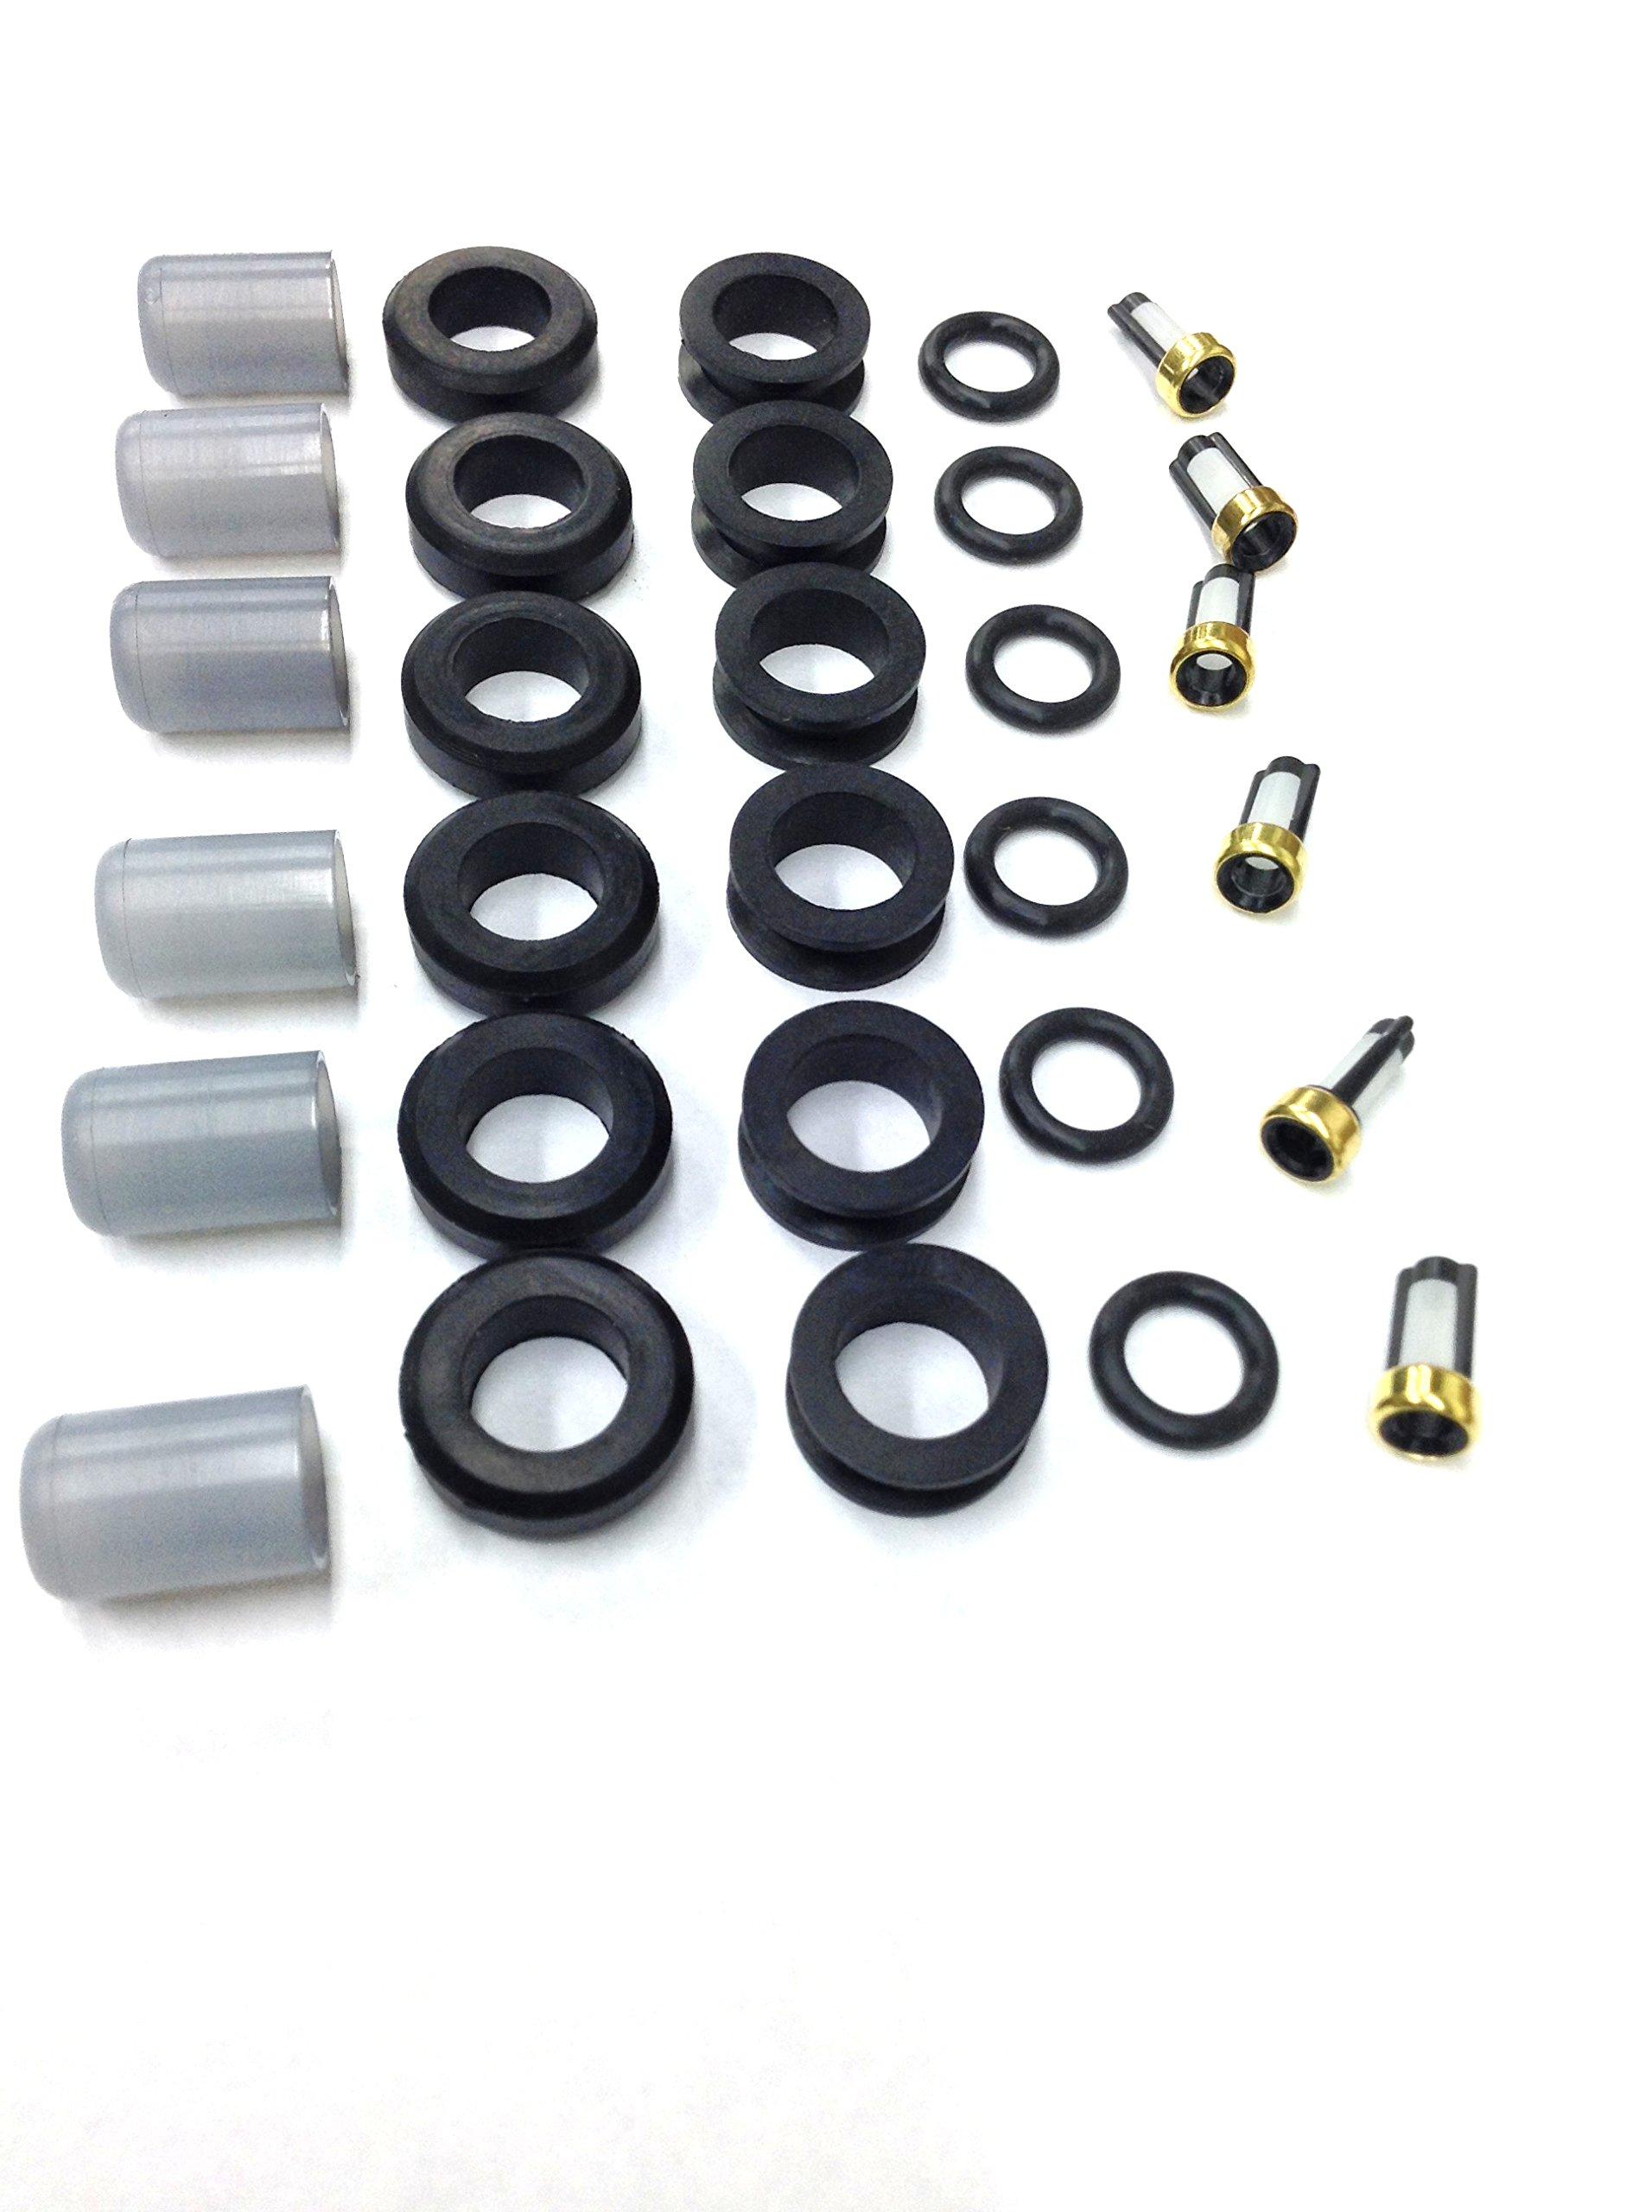 1 Pack UREMCO 12-4 Fuel Injector Seal Kit